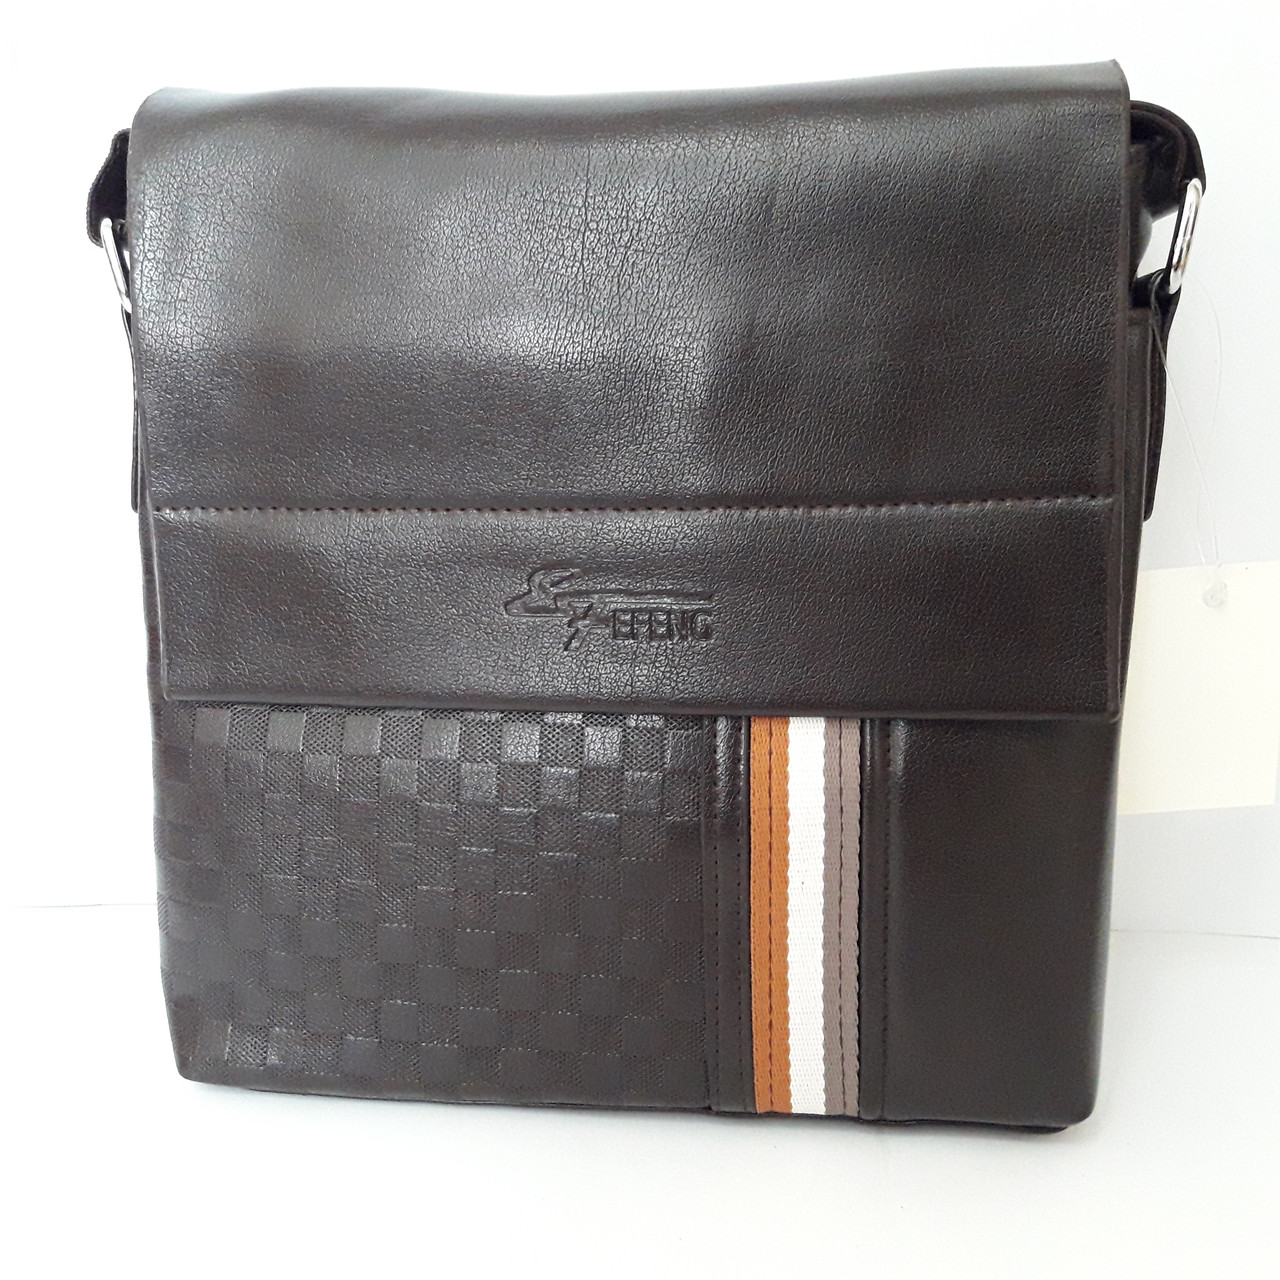 Стильная мужская сумка планшет 26х27х8 см барсетка эко кожа черная